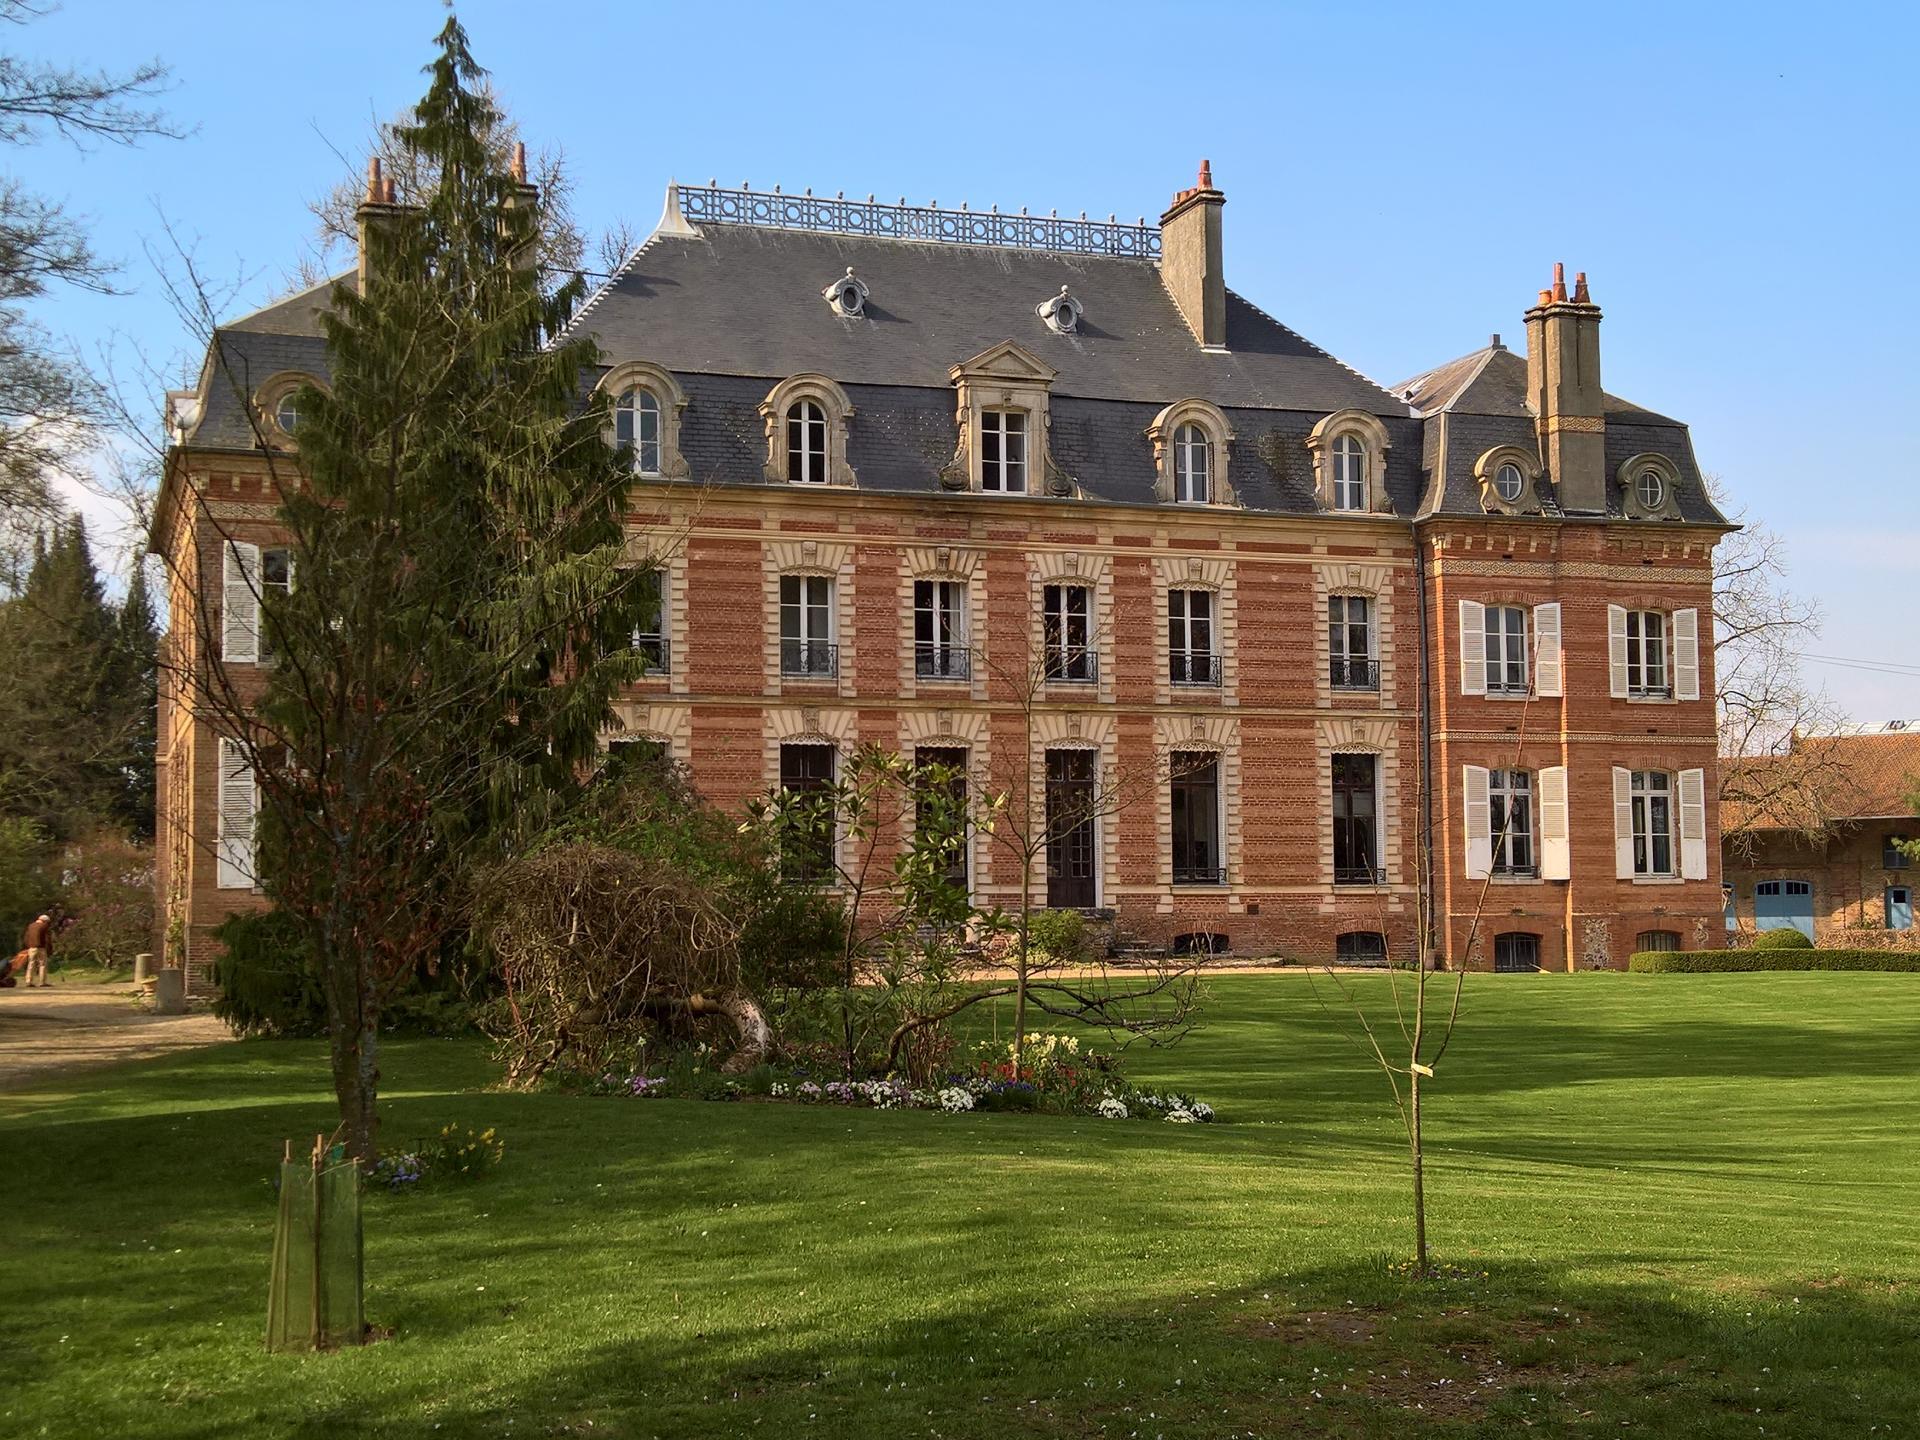 Chateau de digeon circuit touristique nord location rider